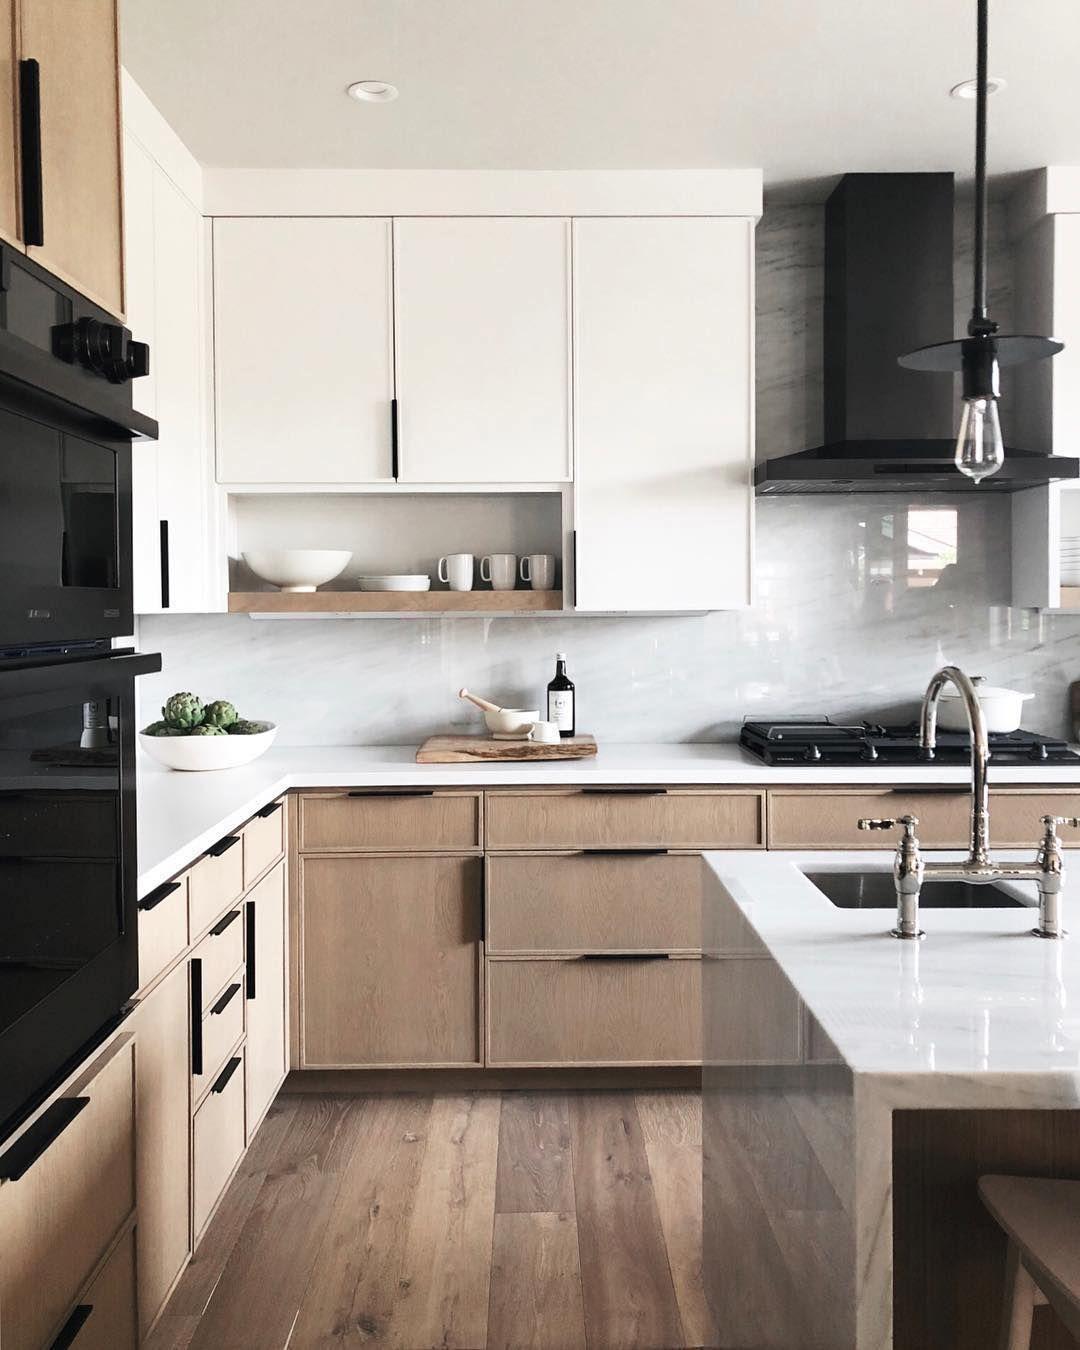 This Kitchen Designed By Lauren Nelson Design For Sunsetmag